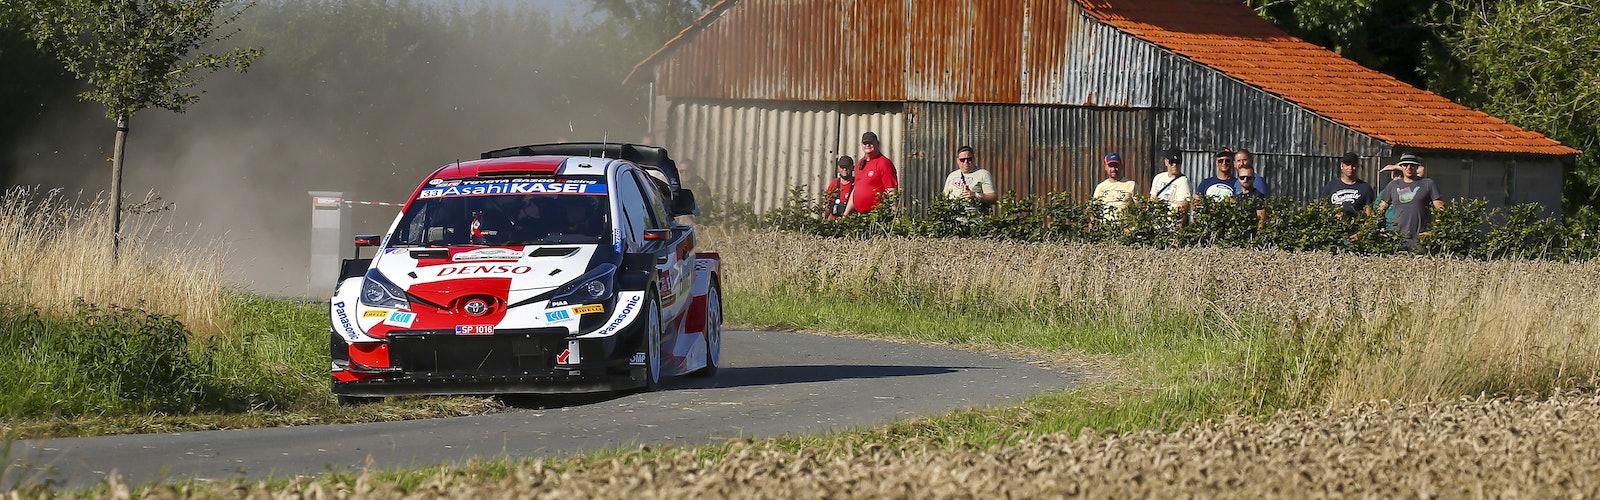 WRC_2021_Rd.9_166